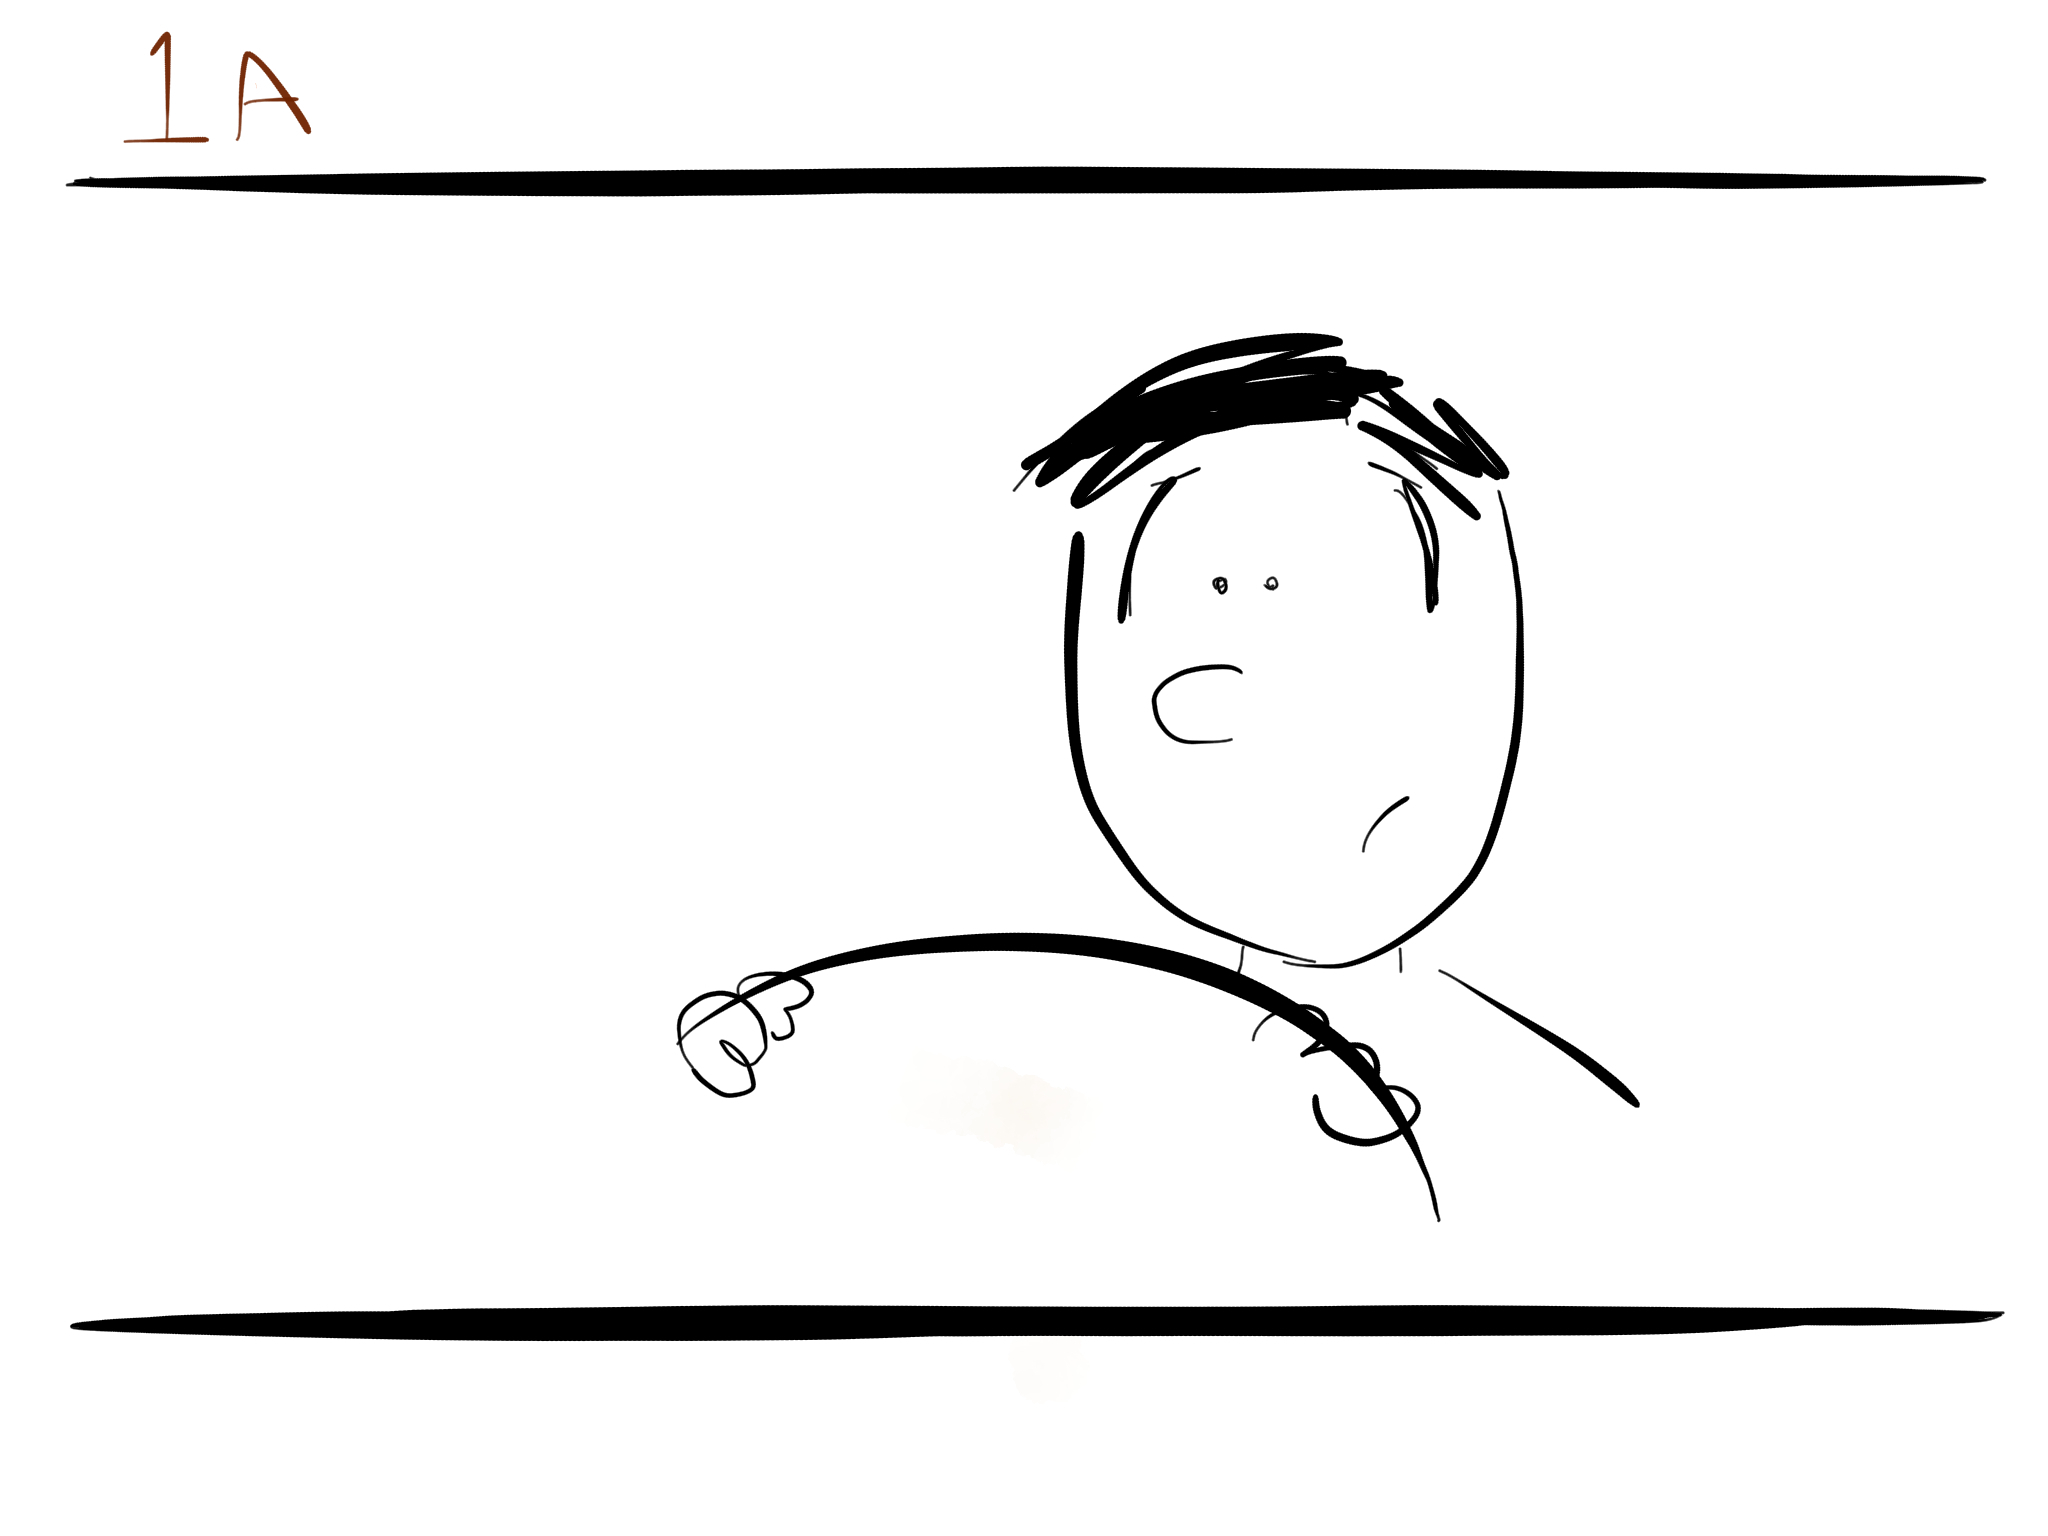 BDF_Storyboards_01.jpg